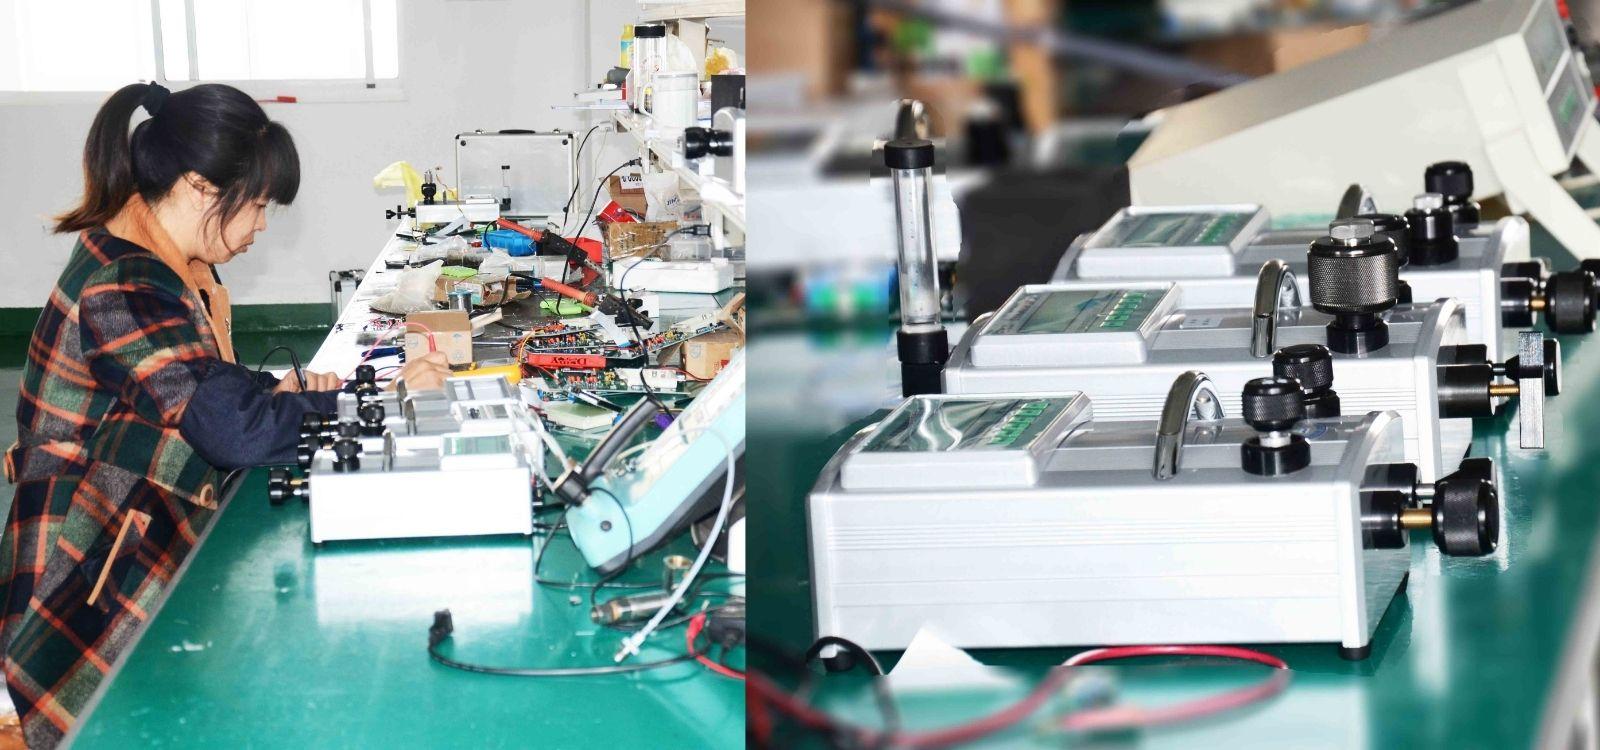 Test-pressure calibrator